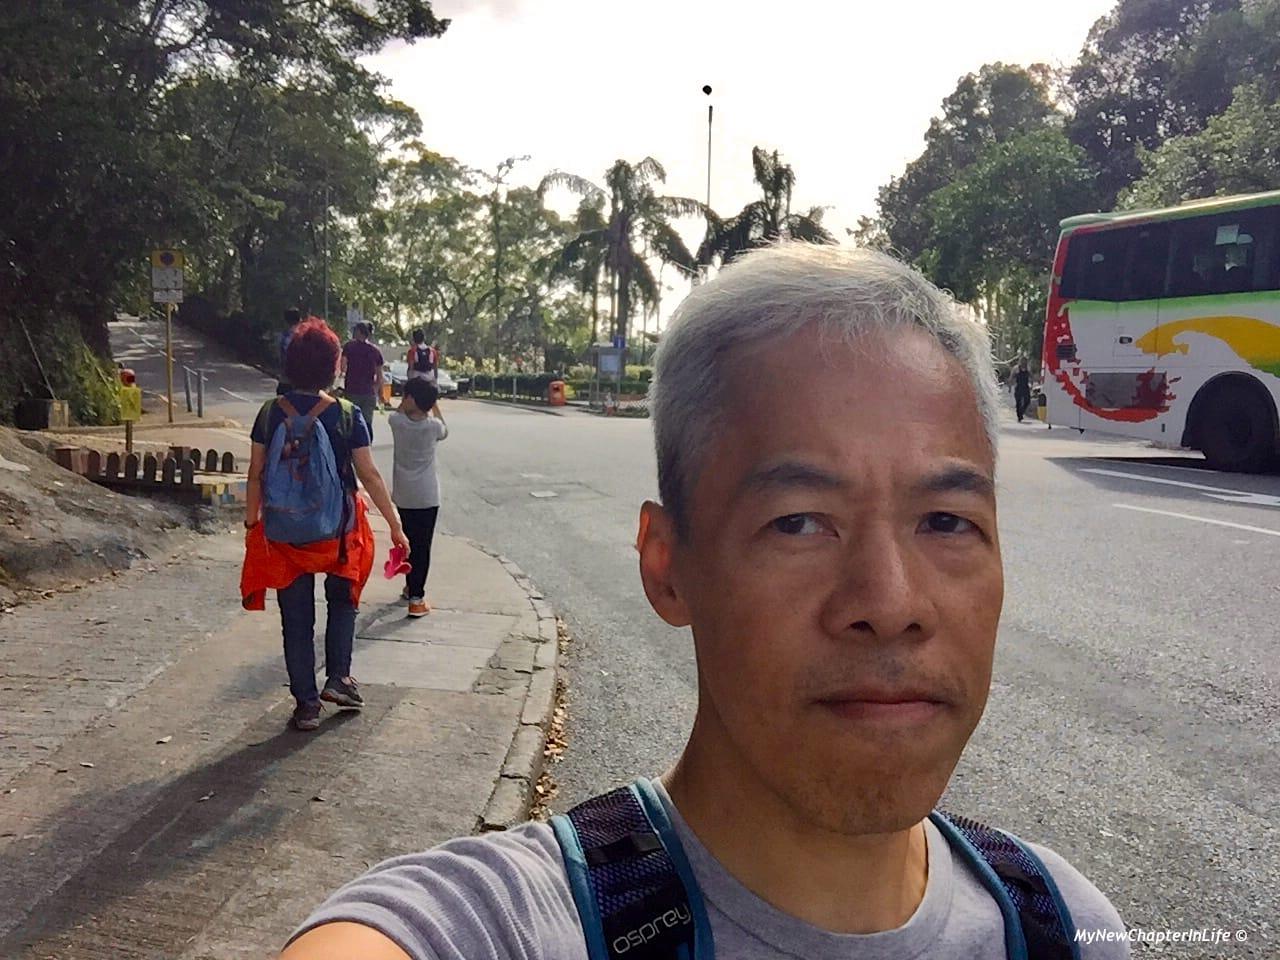 背景是灣仔峽道遊樂場 Wanchai Gap Park in the background